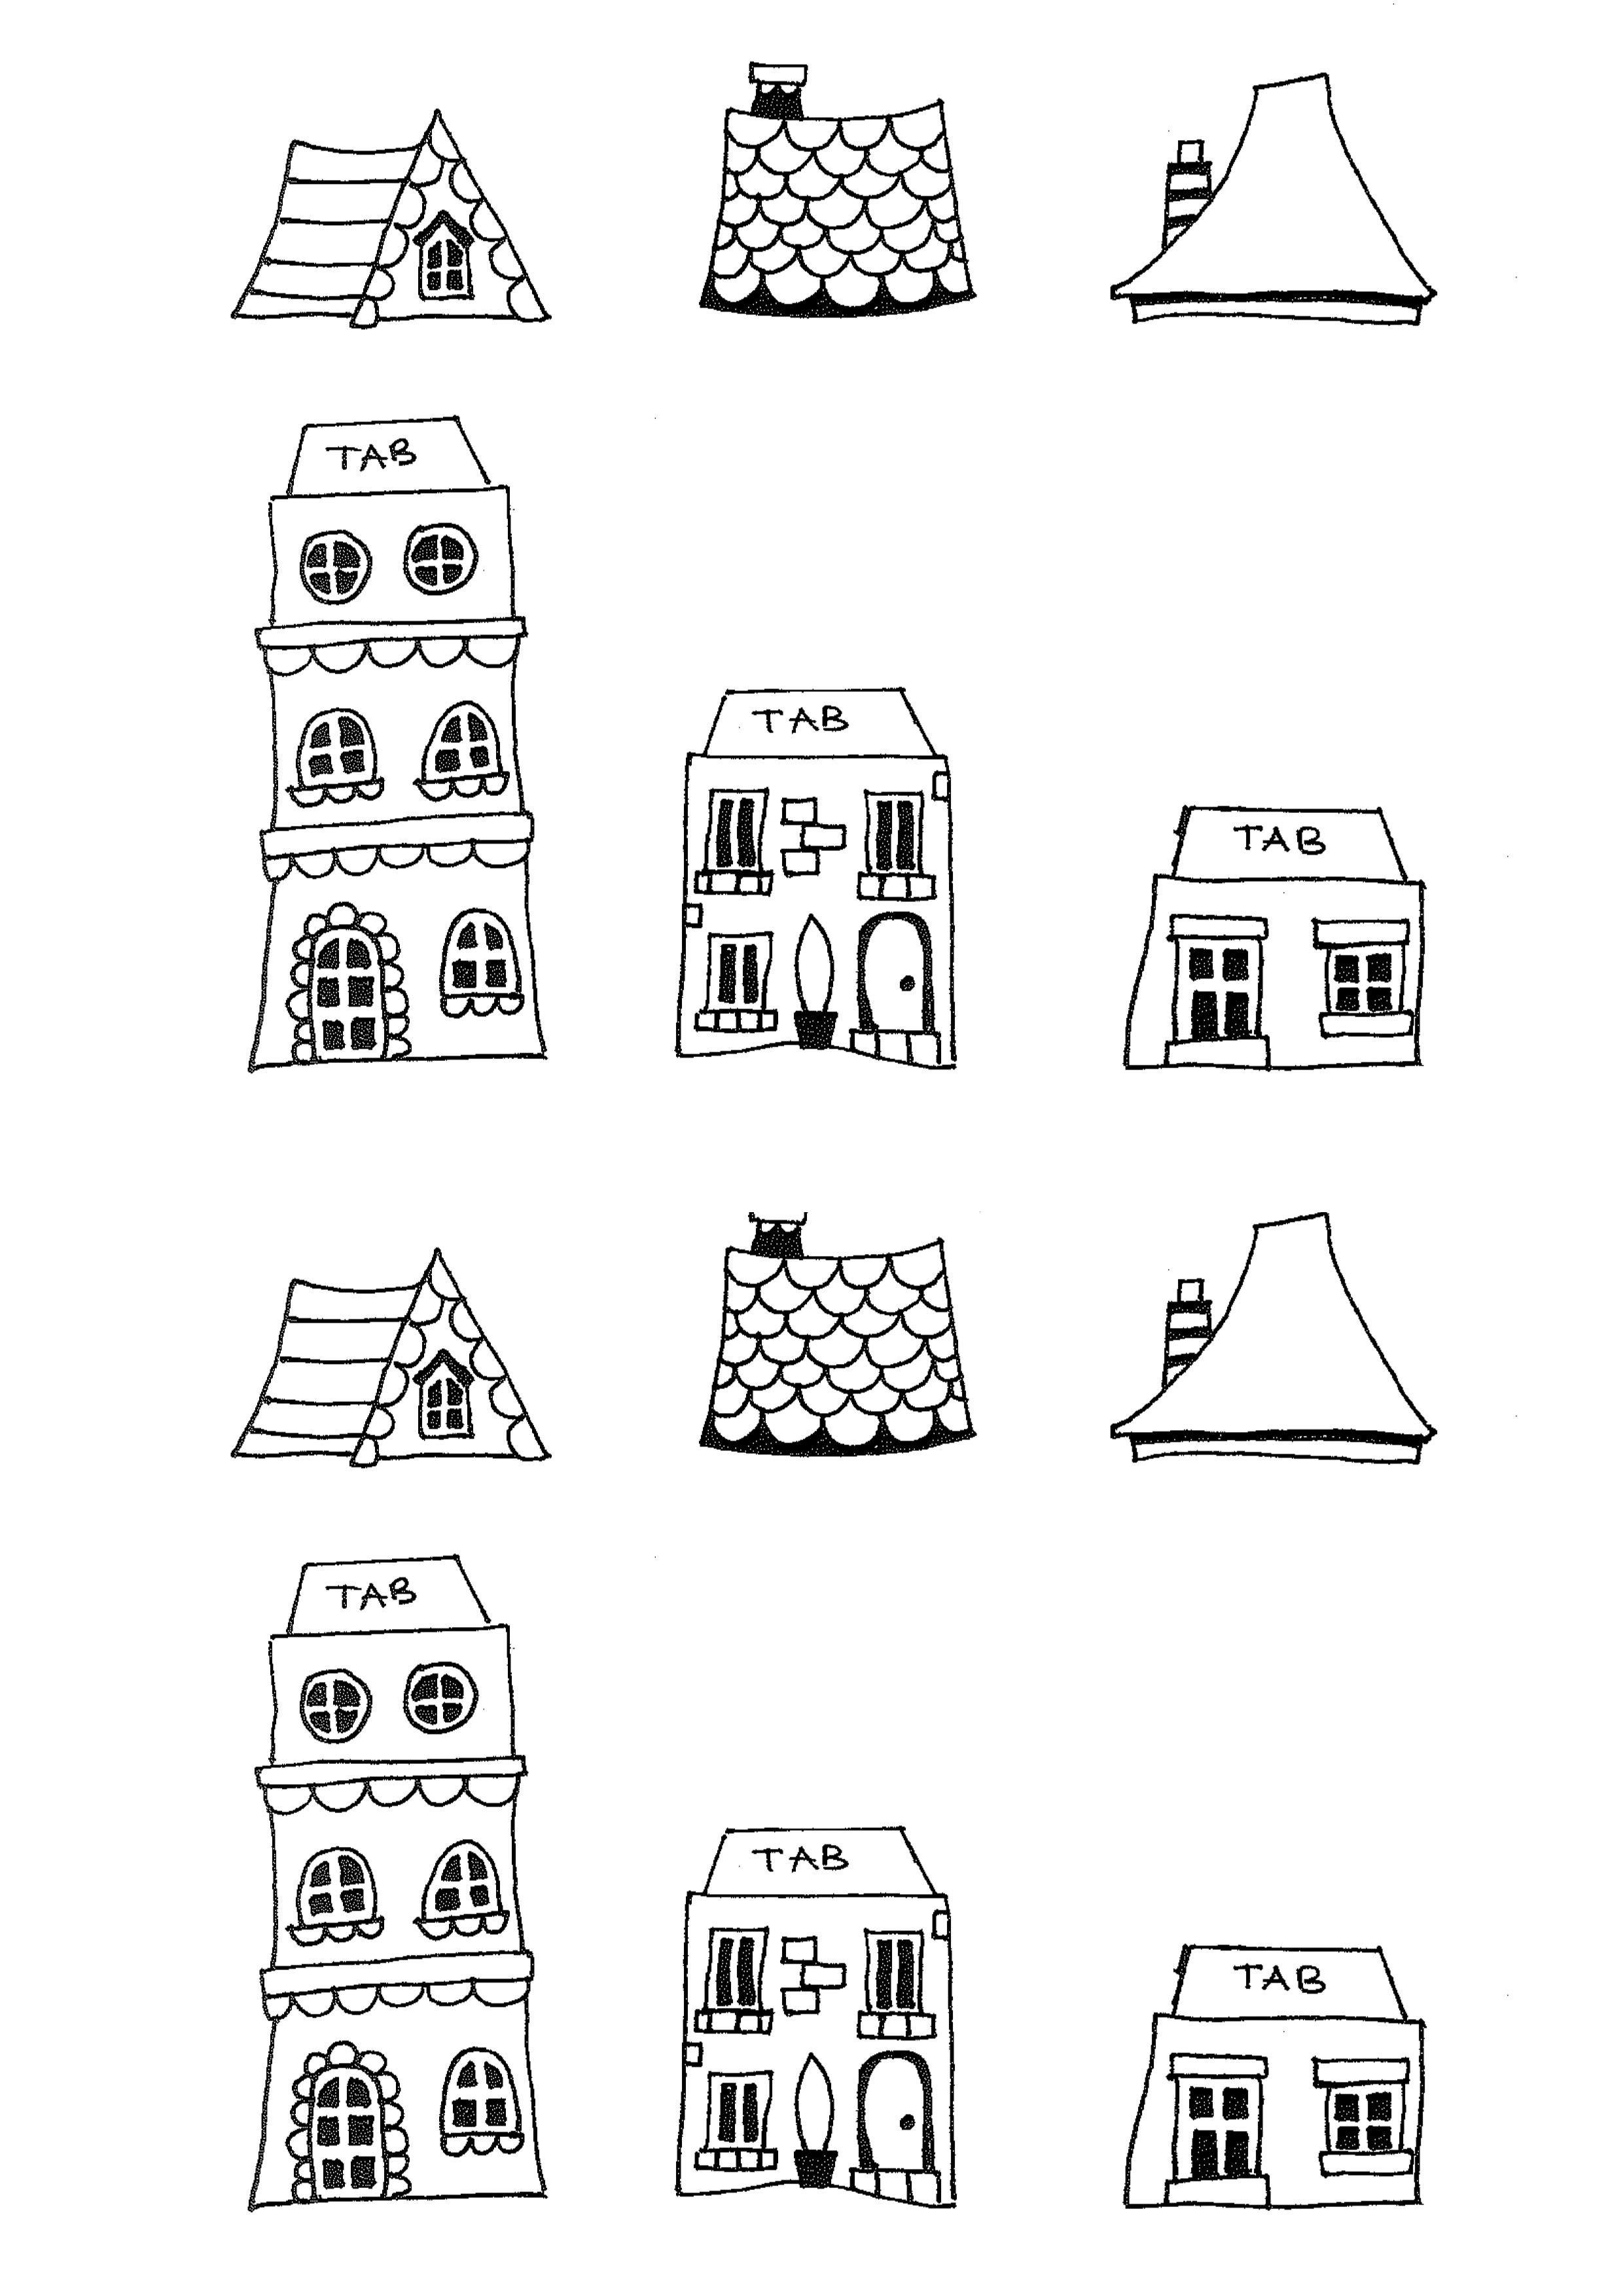 Free Printable House Templates | Printables | New Home Cards, House - Welcome Home Cards Free Printable